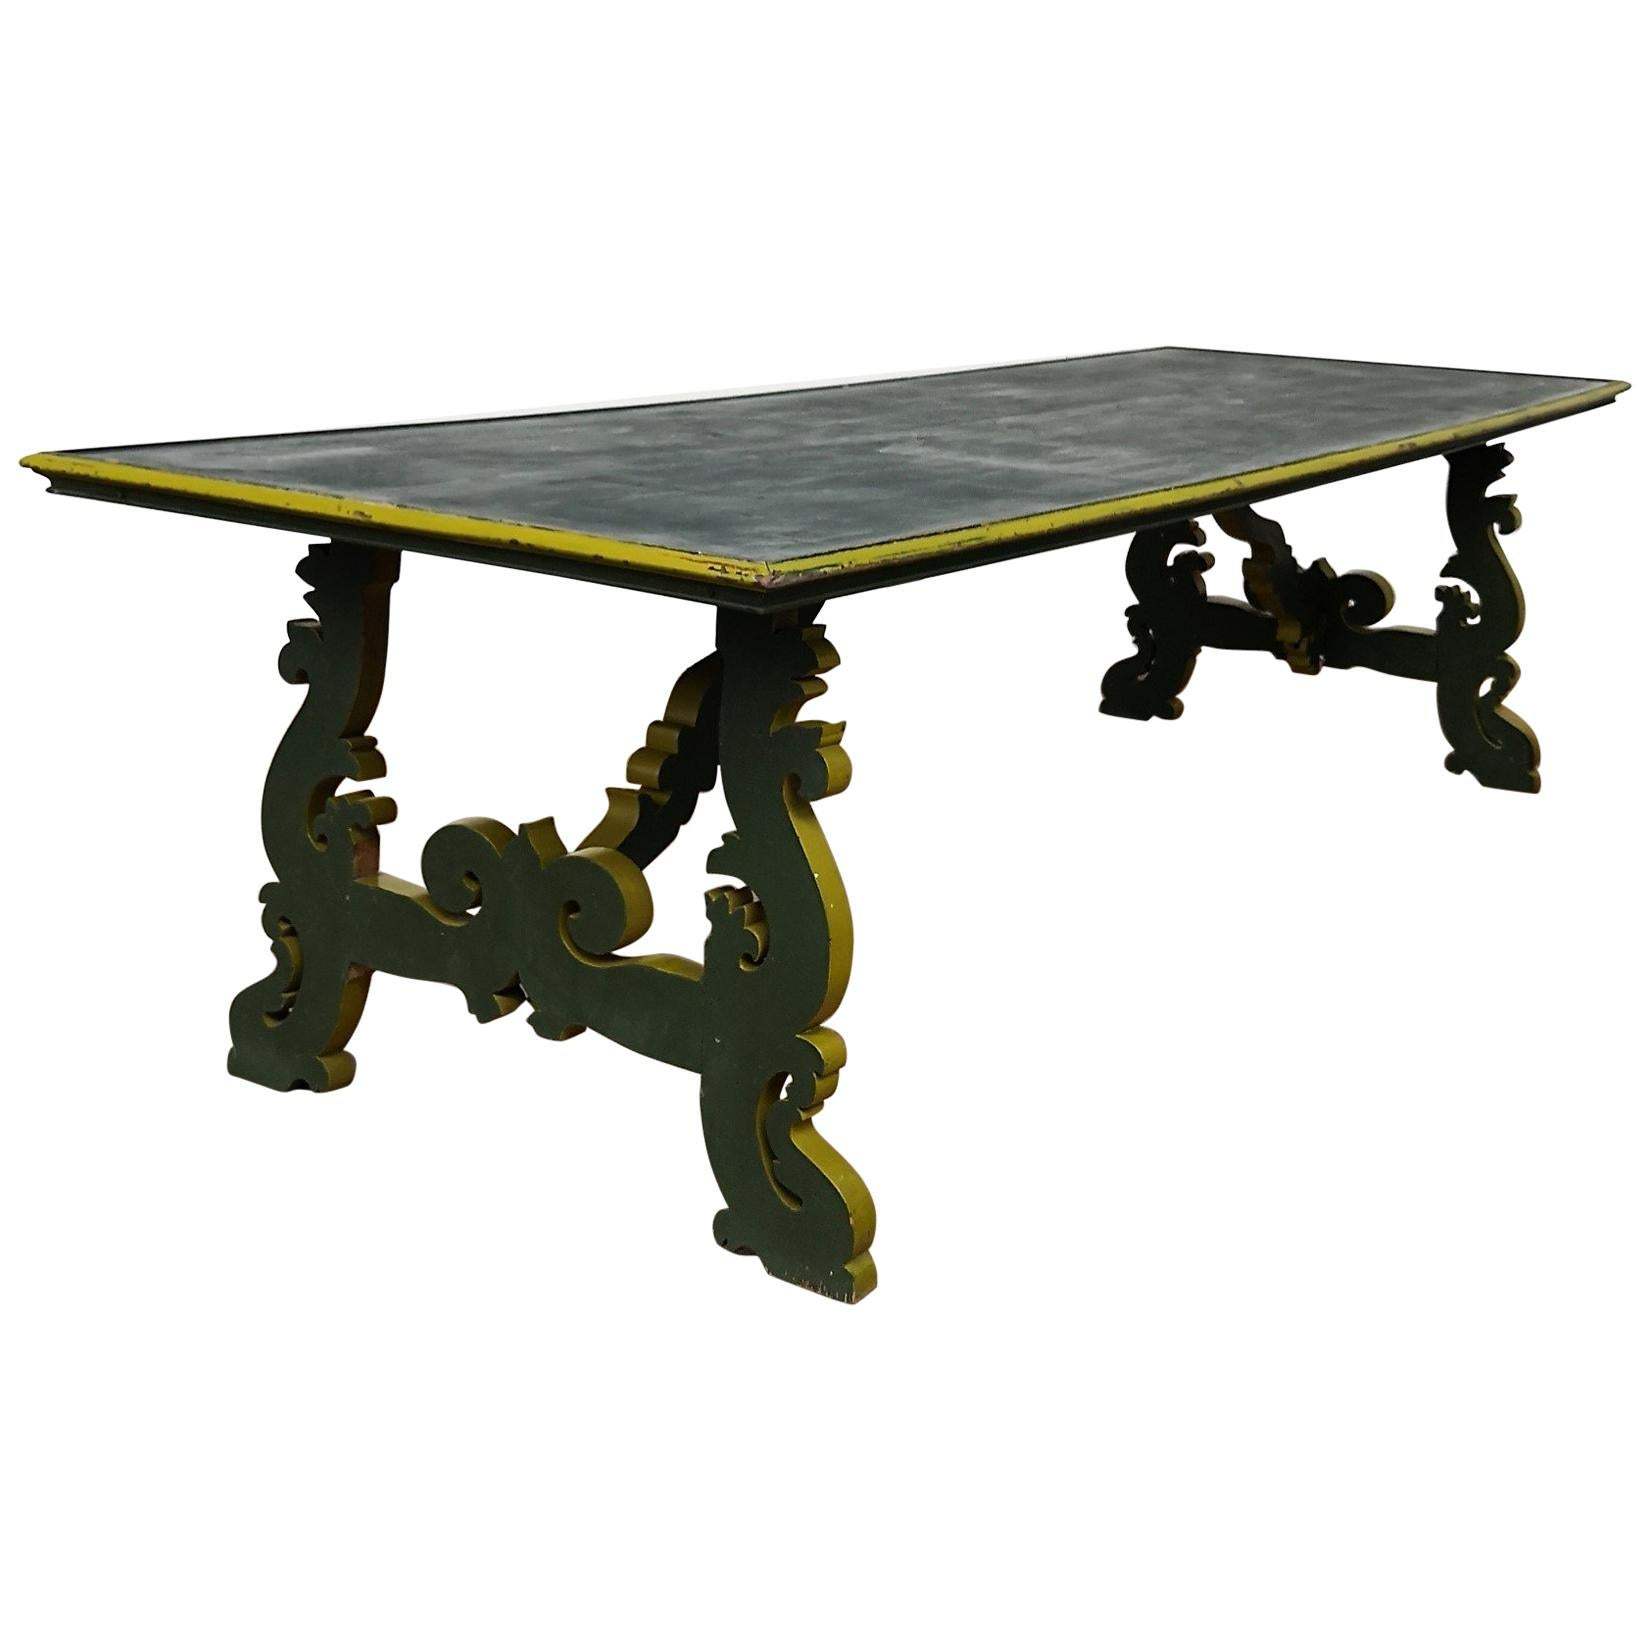 20th Century Italian Baroque Style Lyre-Shaped Legs Trestle Farm Dining Table